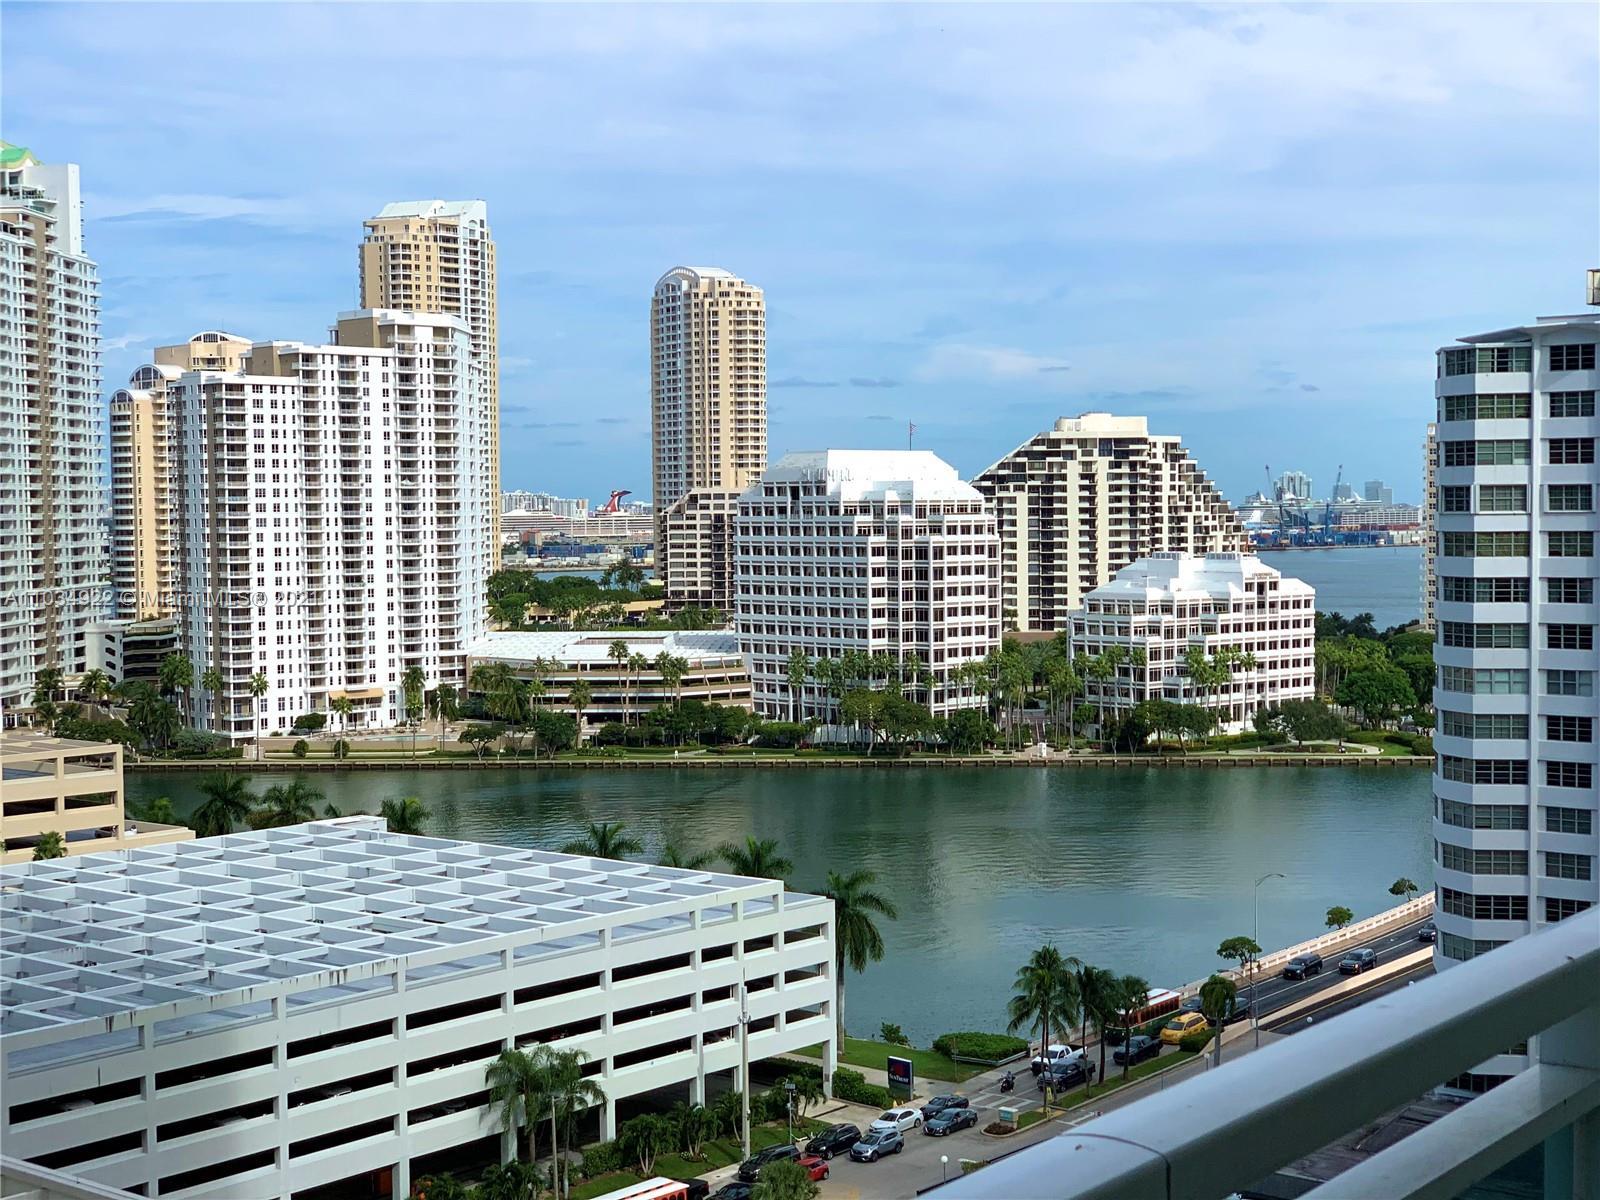 The Plaza on Brickell 1 #1504 - 950 Brickell Bay Dr #1504, Miami, FL 33131